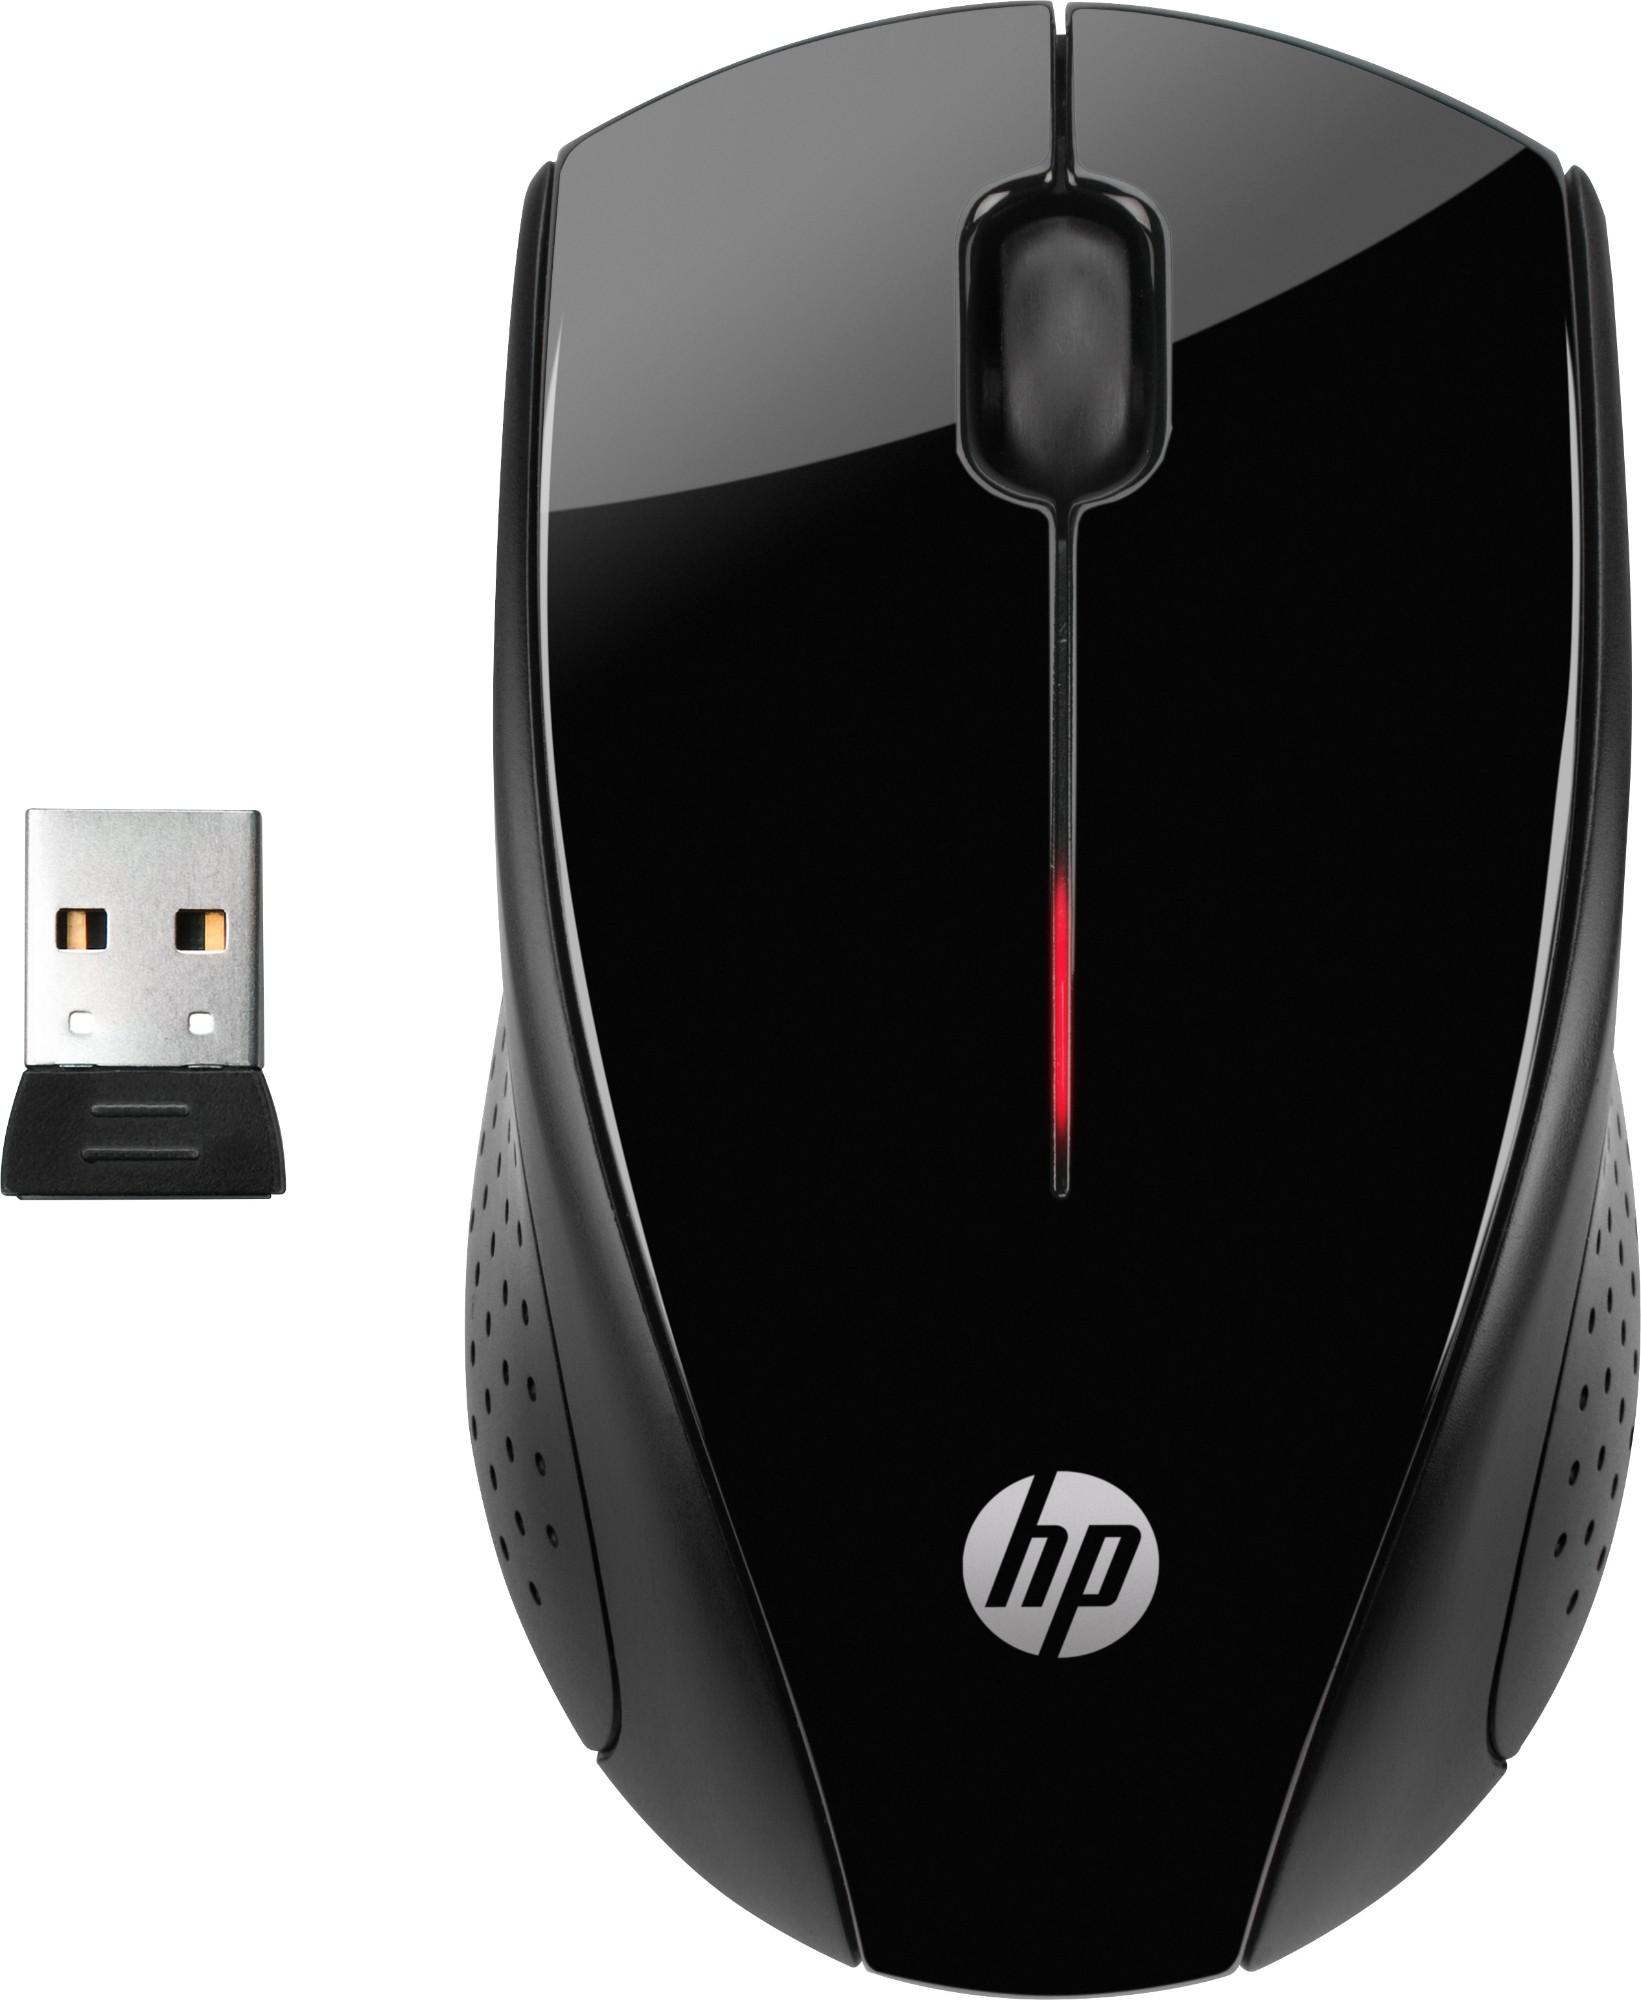 HP X3000 mouse RF Wireless Optical 1200 DPI Ambidextrous